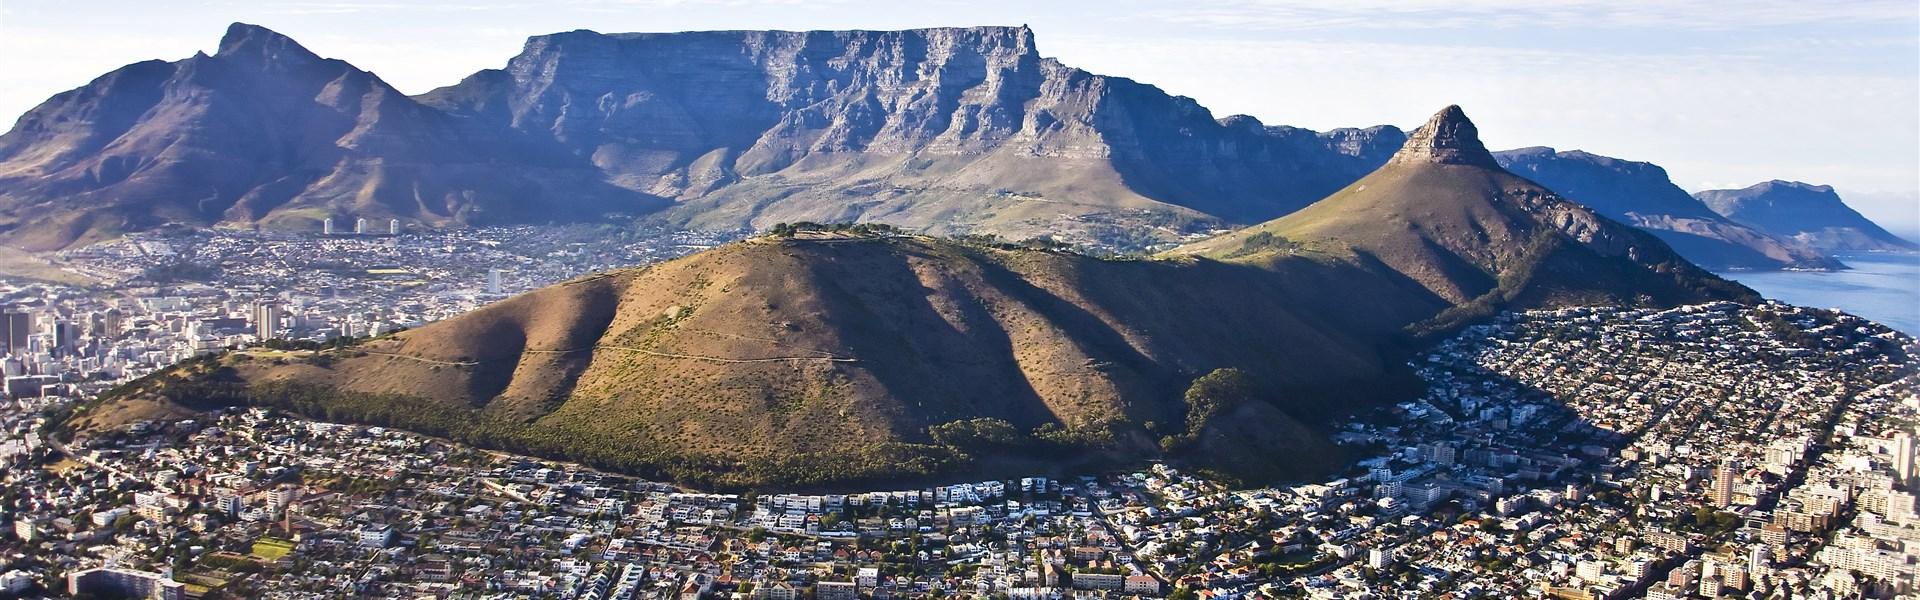 Jihoafrická republika -